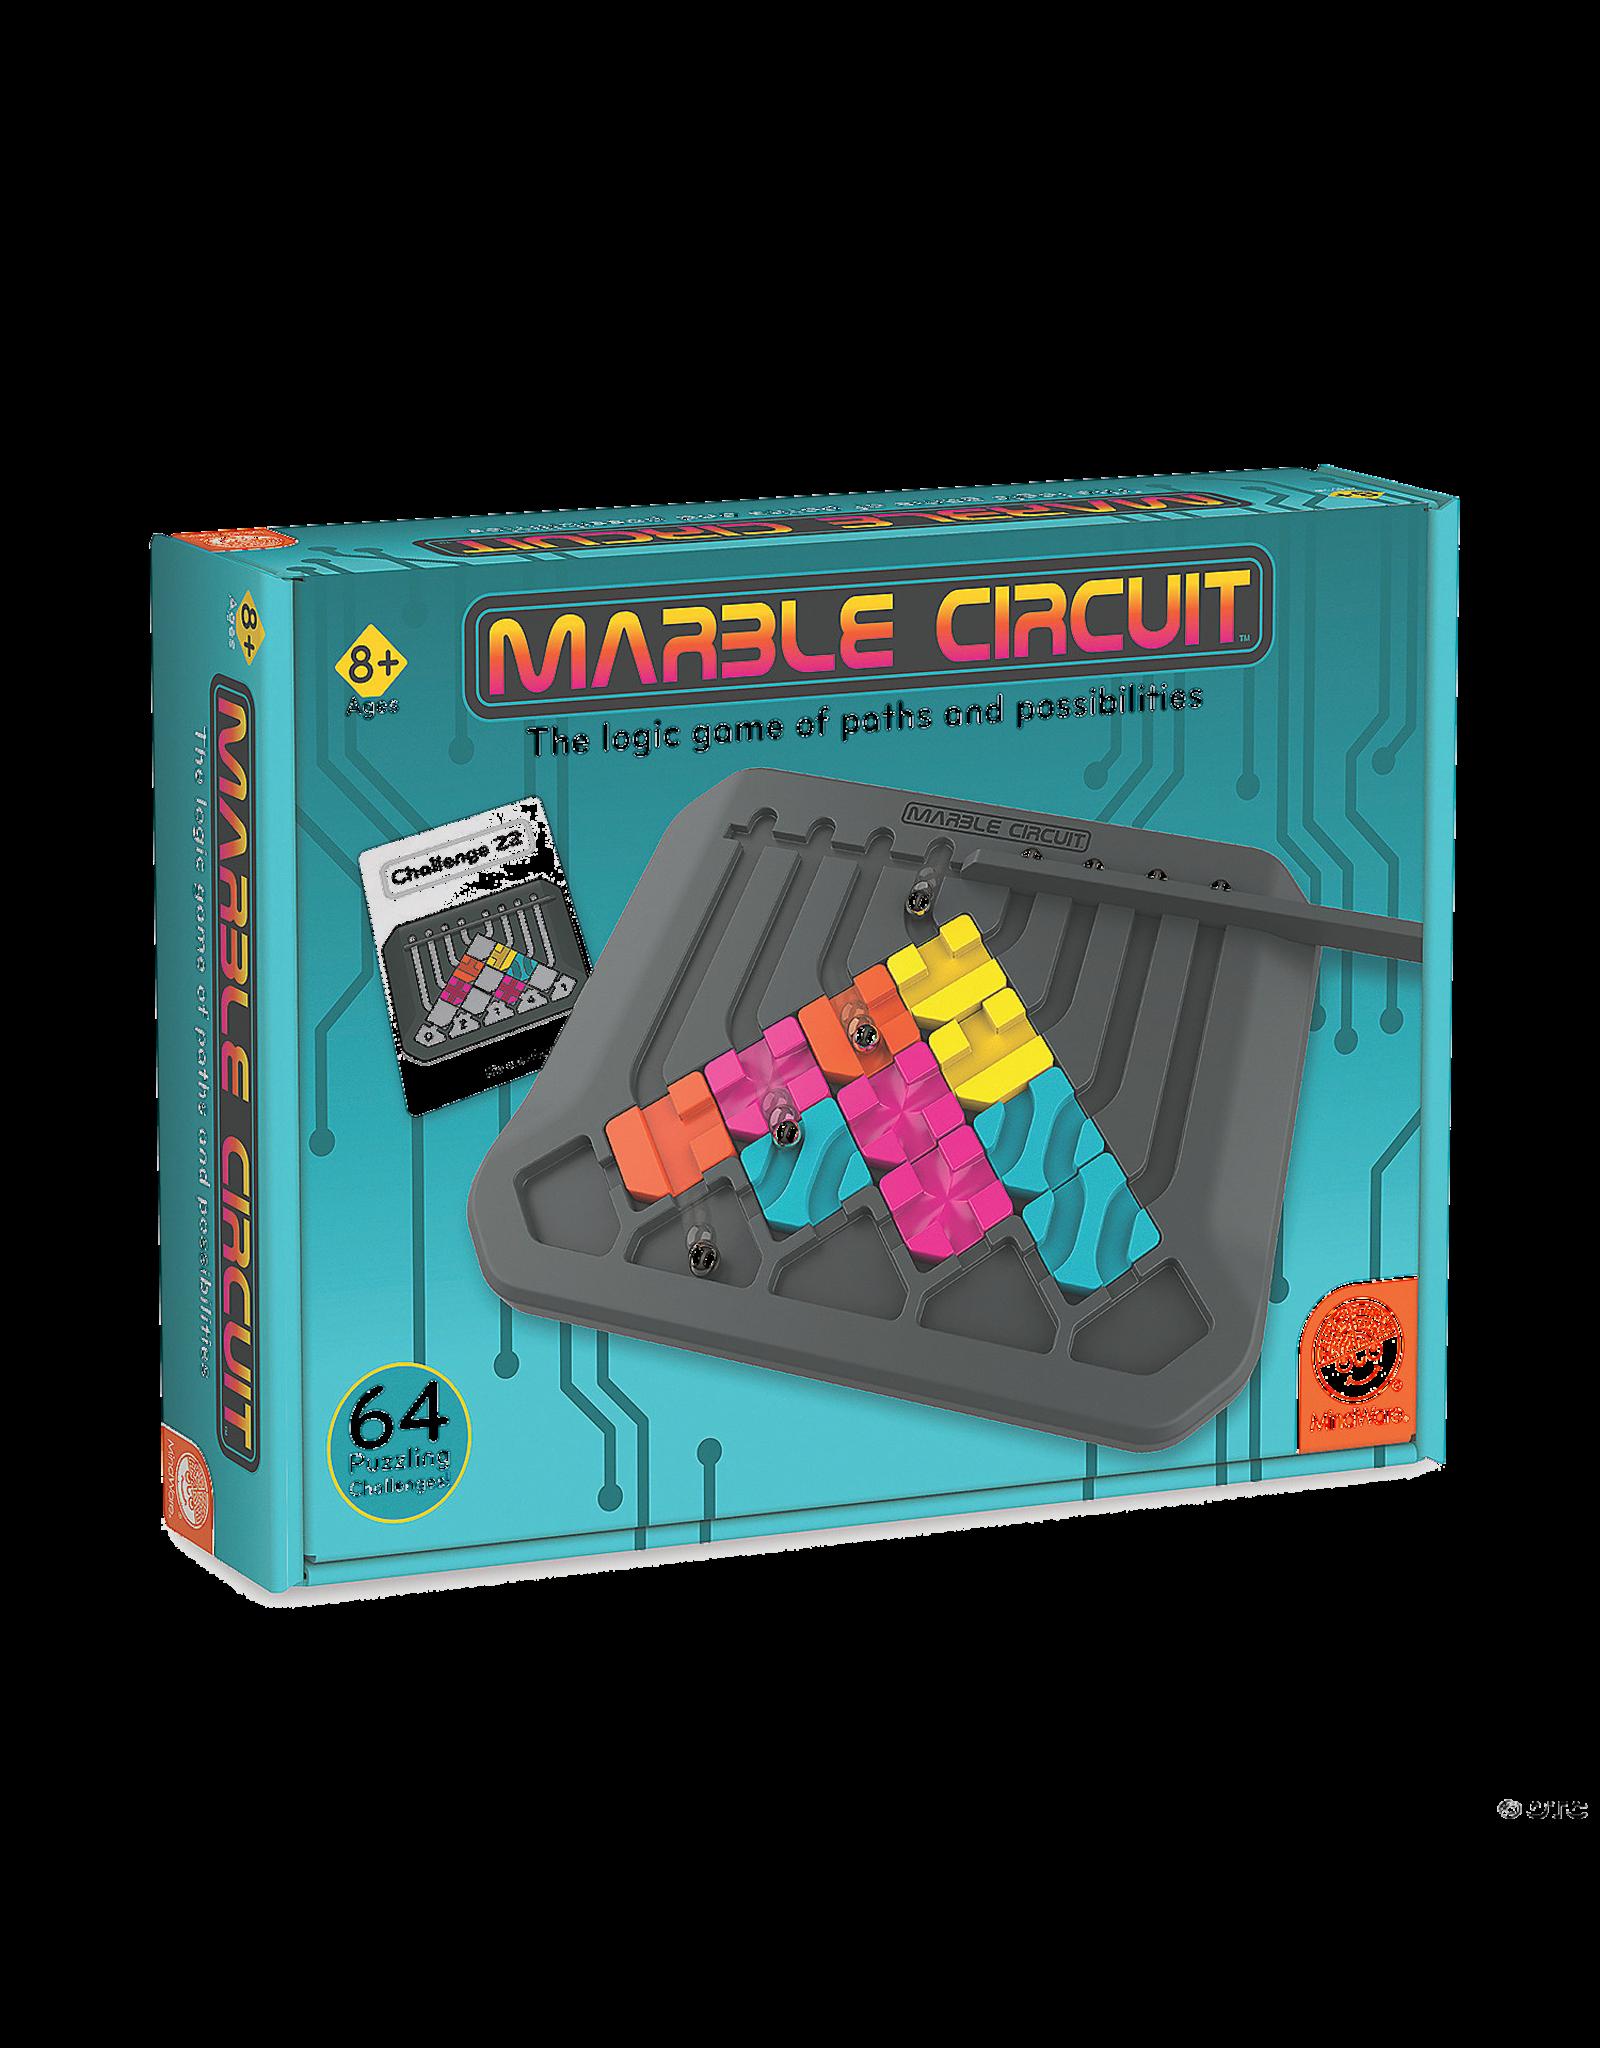 Marble Circuit